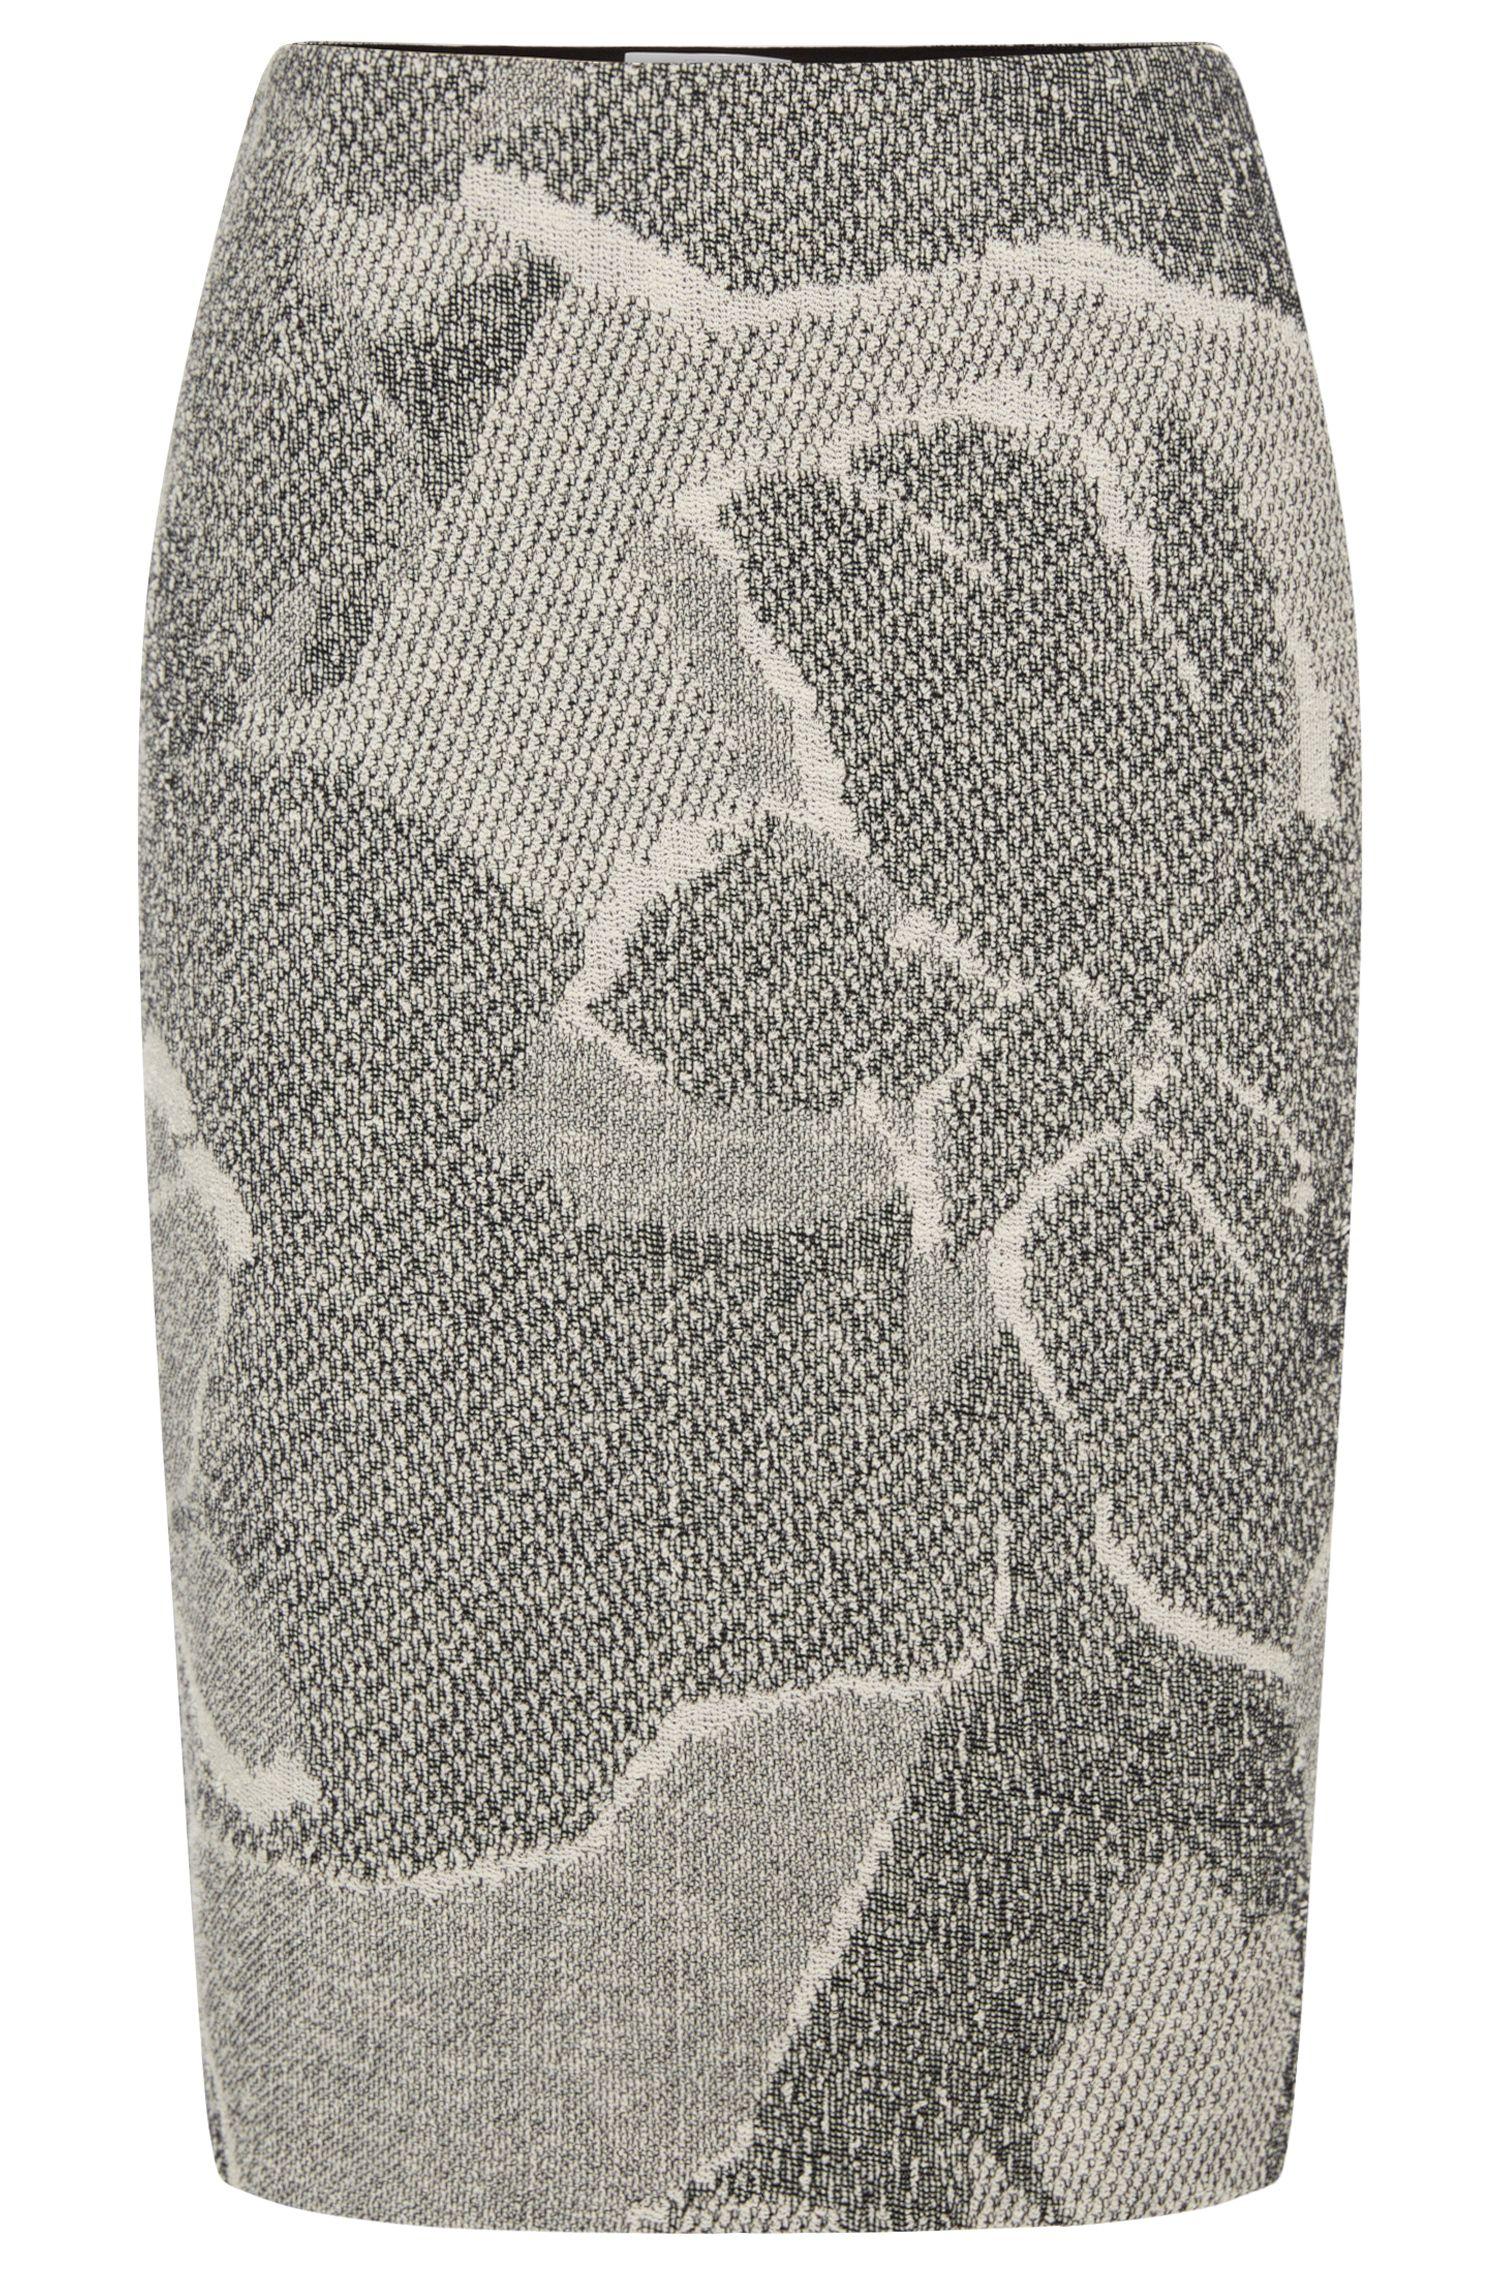 Jacquard Cotton Blend Floral Boucle Skirt | Marala